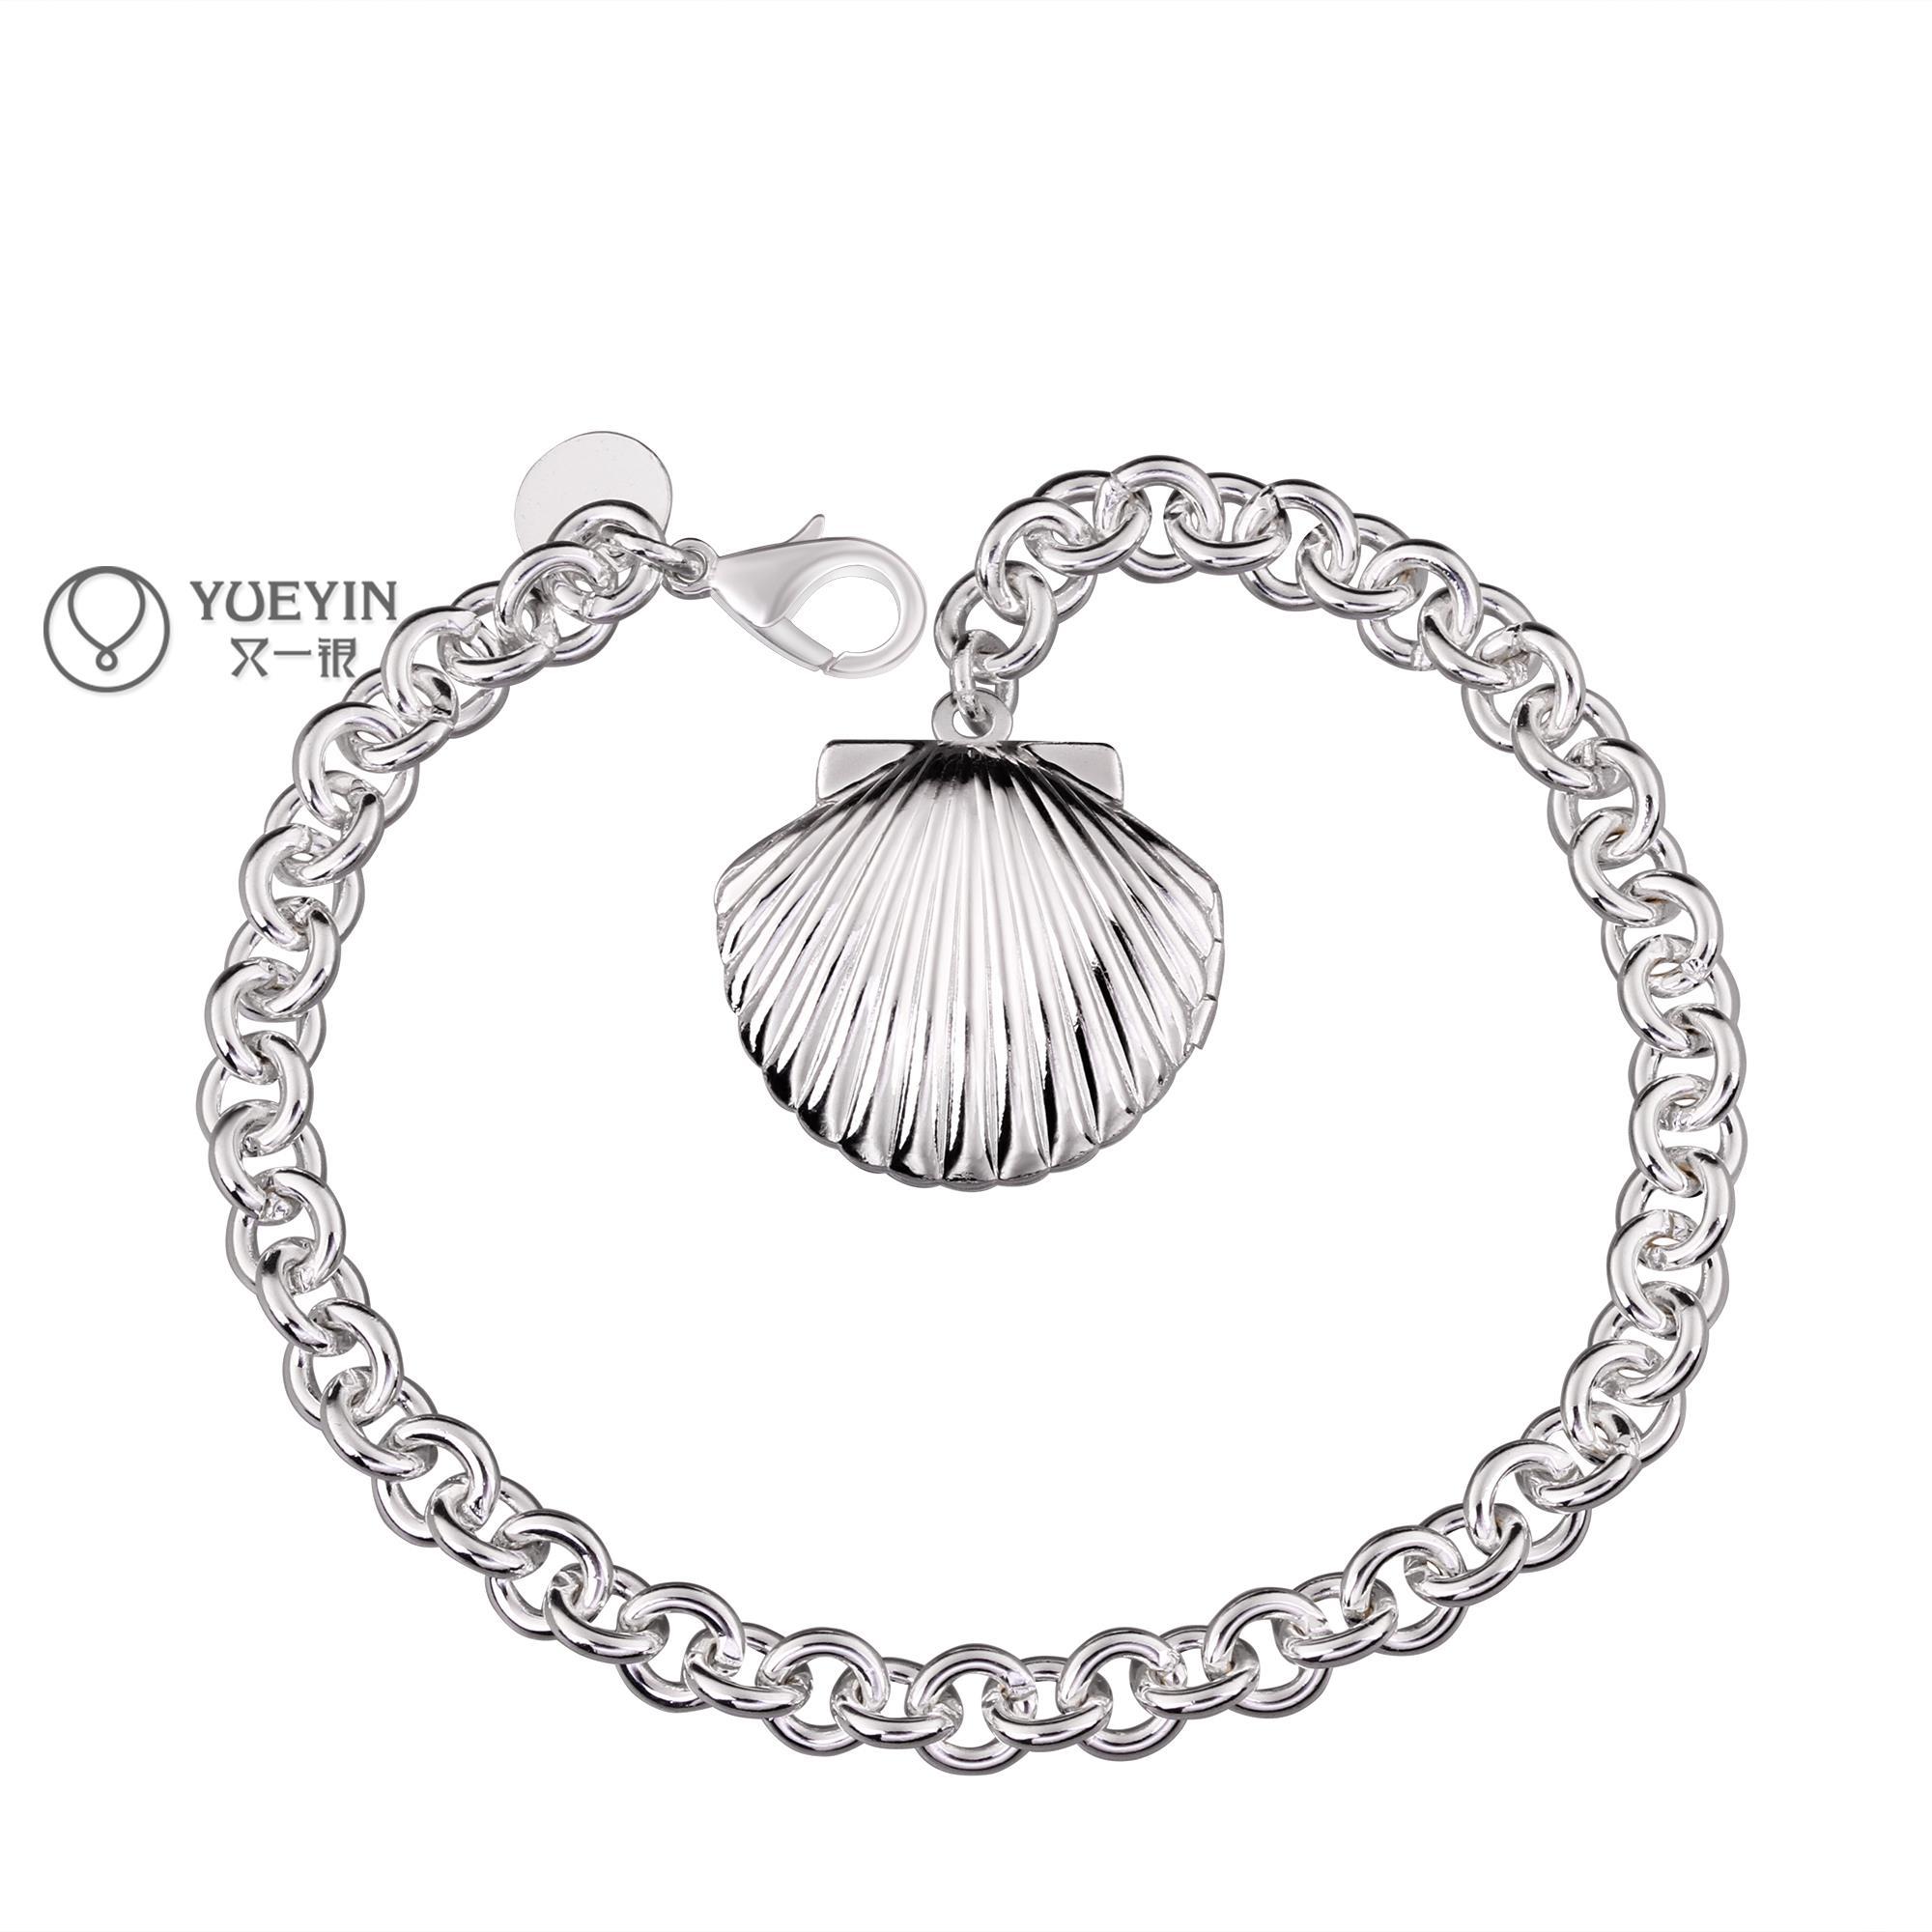 Inexpensive Charm Bracelets: H346 2015 New Women Charm Bracelets Valentine's Day Gifts